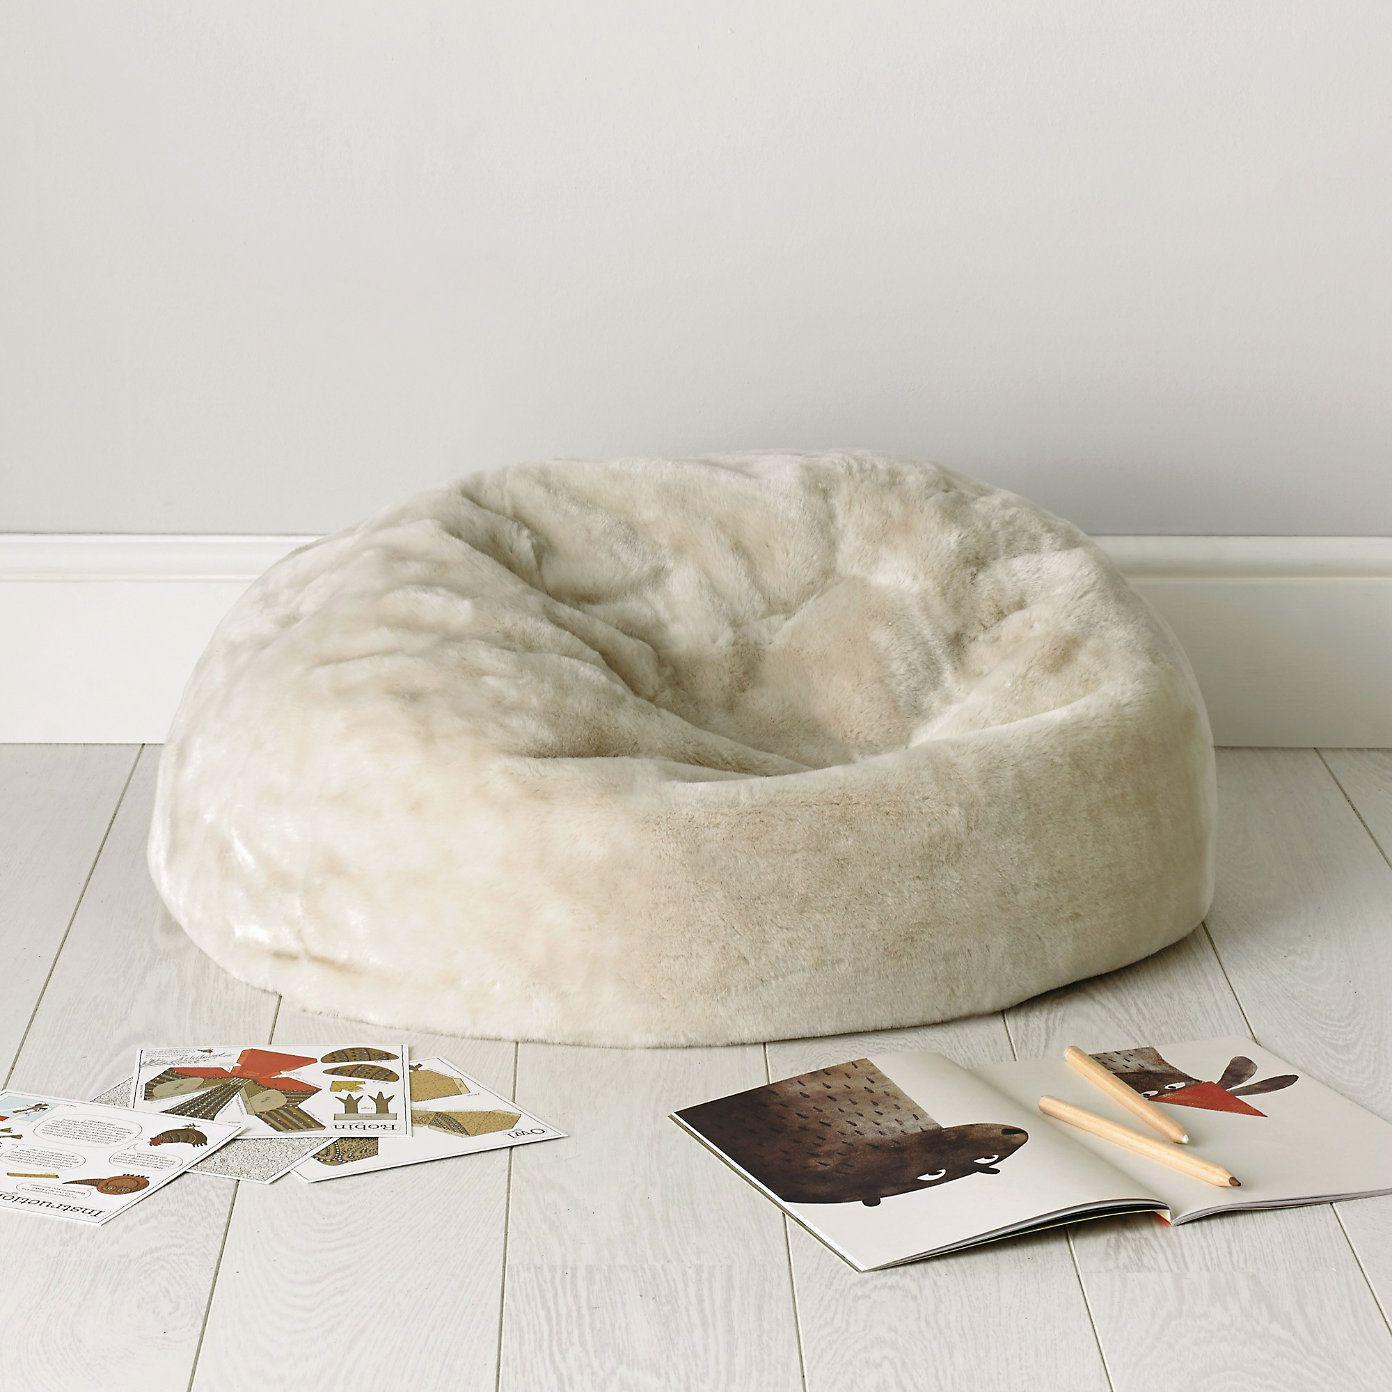 Buy Childrens Bedroom Bedroom Accessories Faux Fur Beanbag